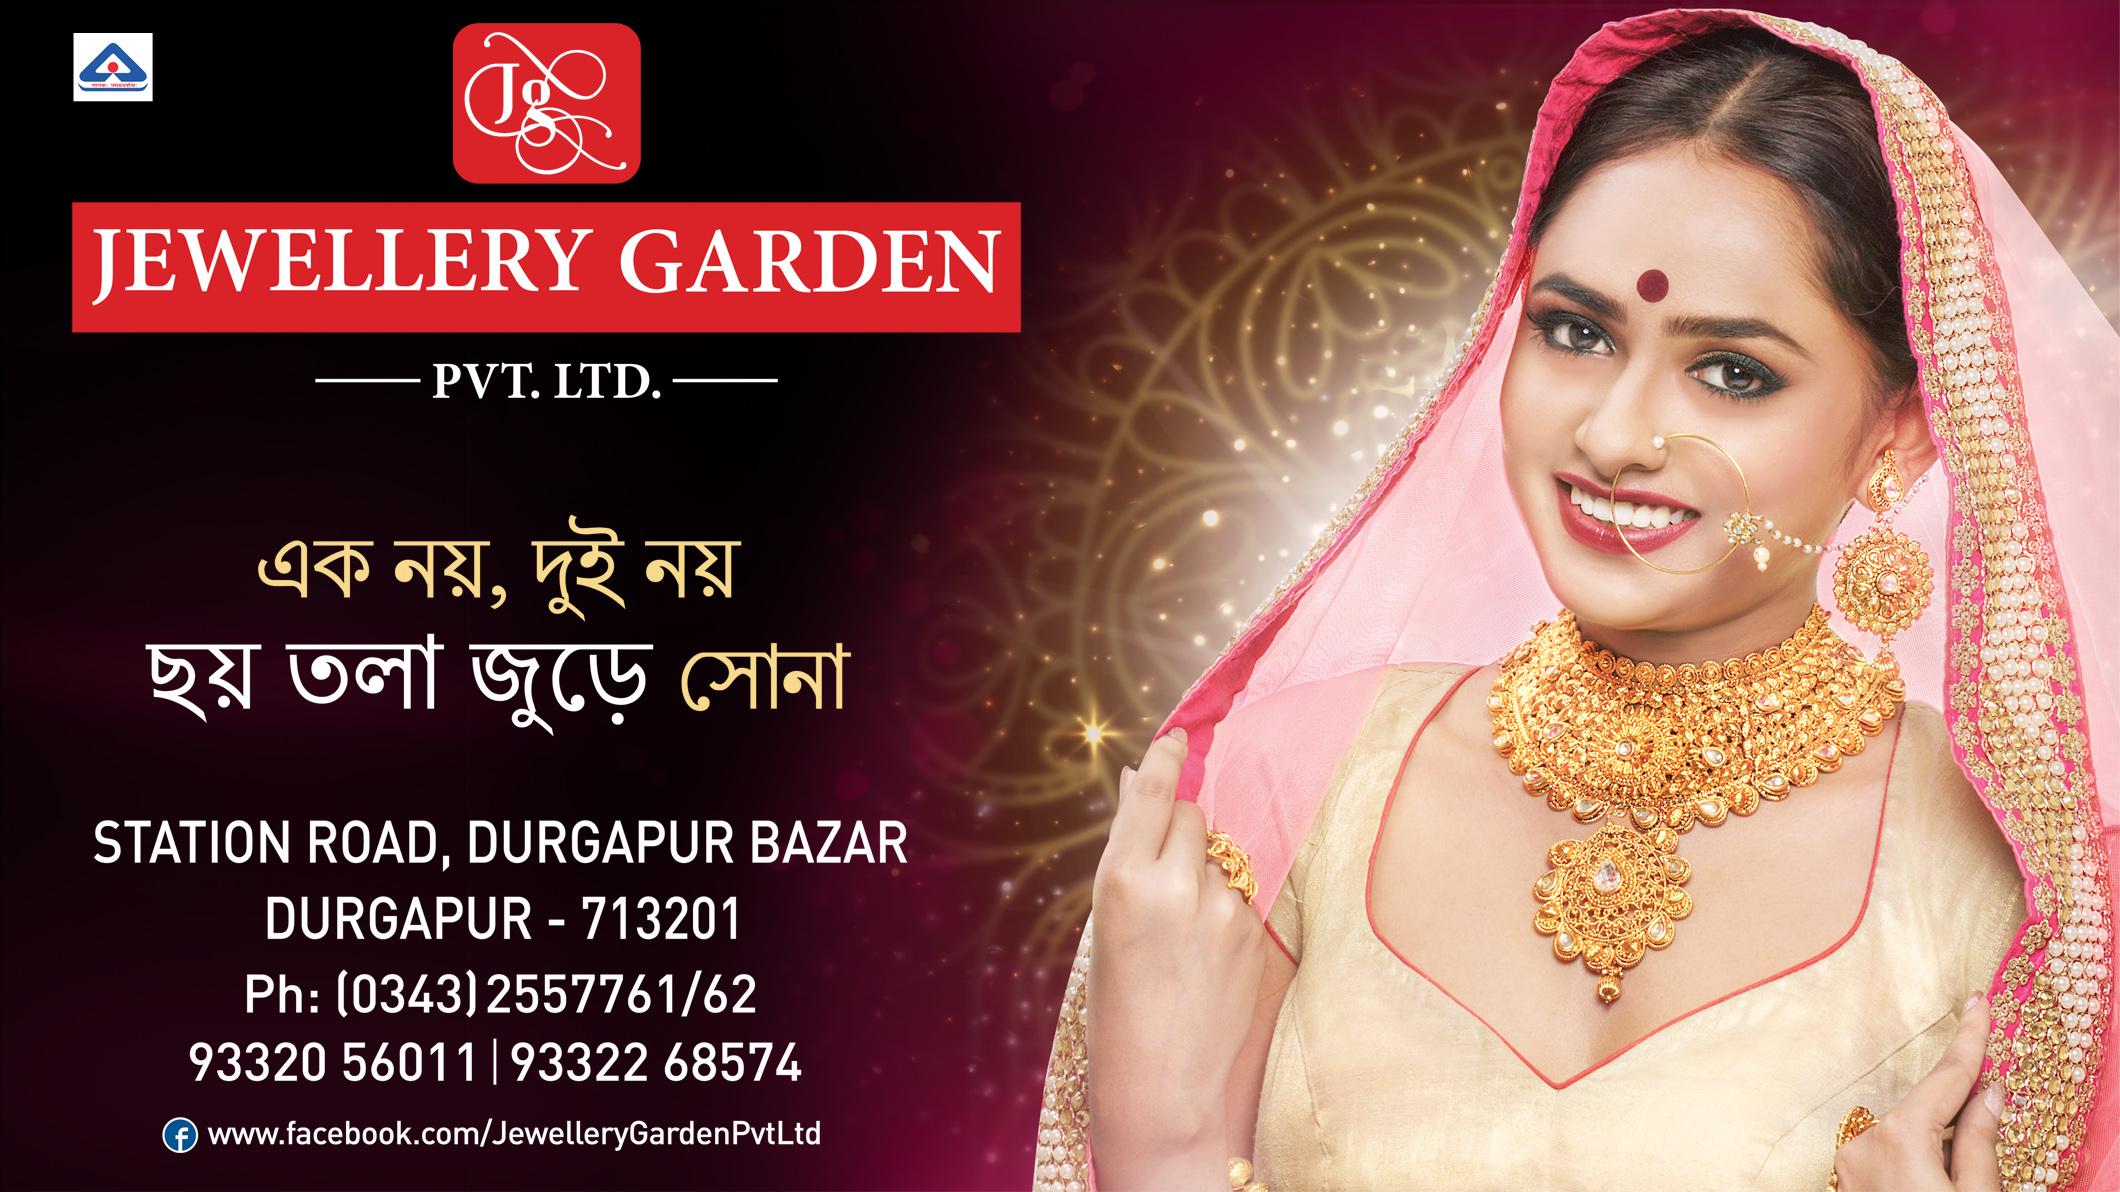 Jewellery Garden Pvt Ltd